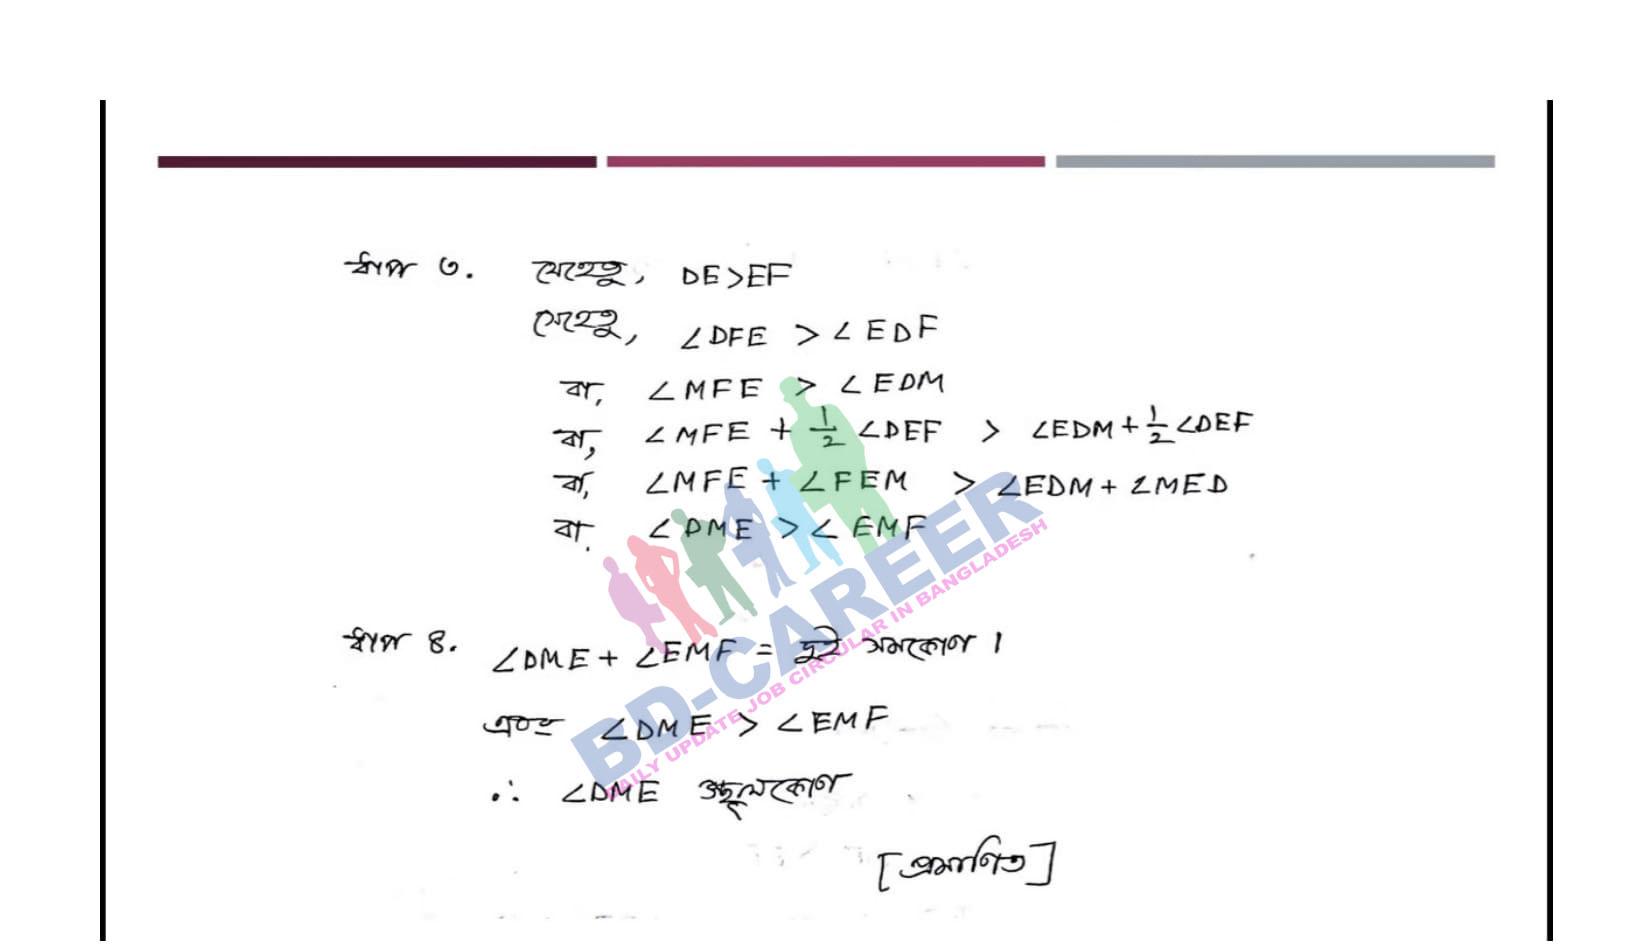 assigment-4th-class-9-math-answer-2020-10